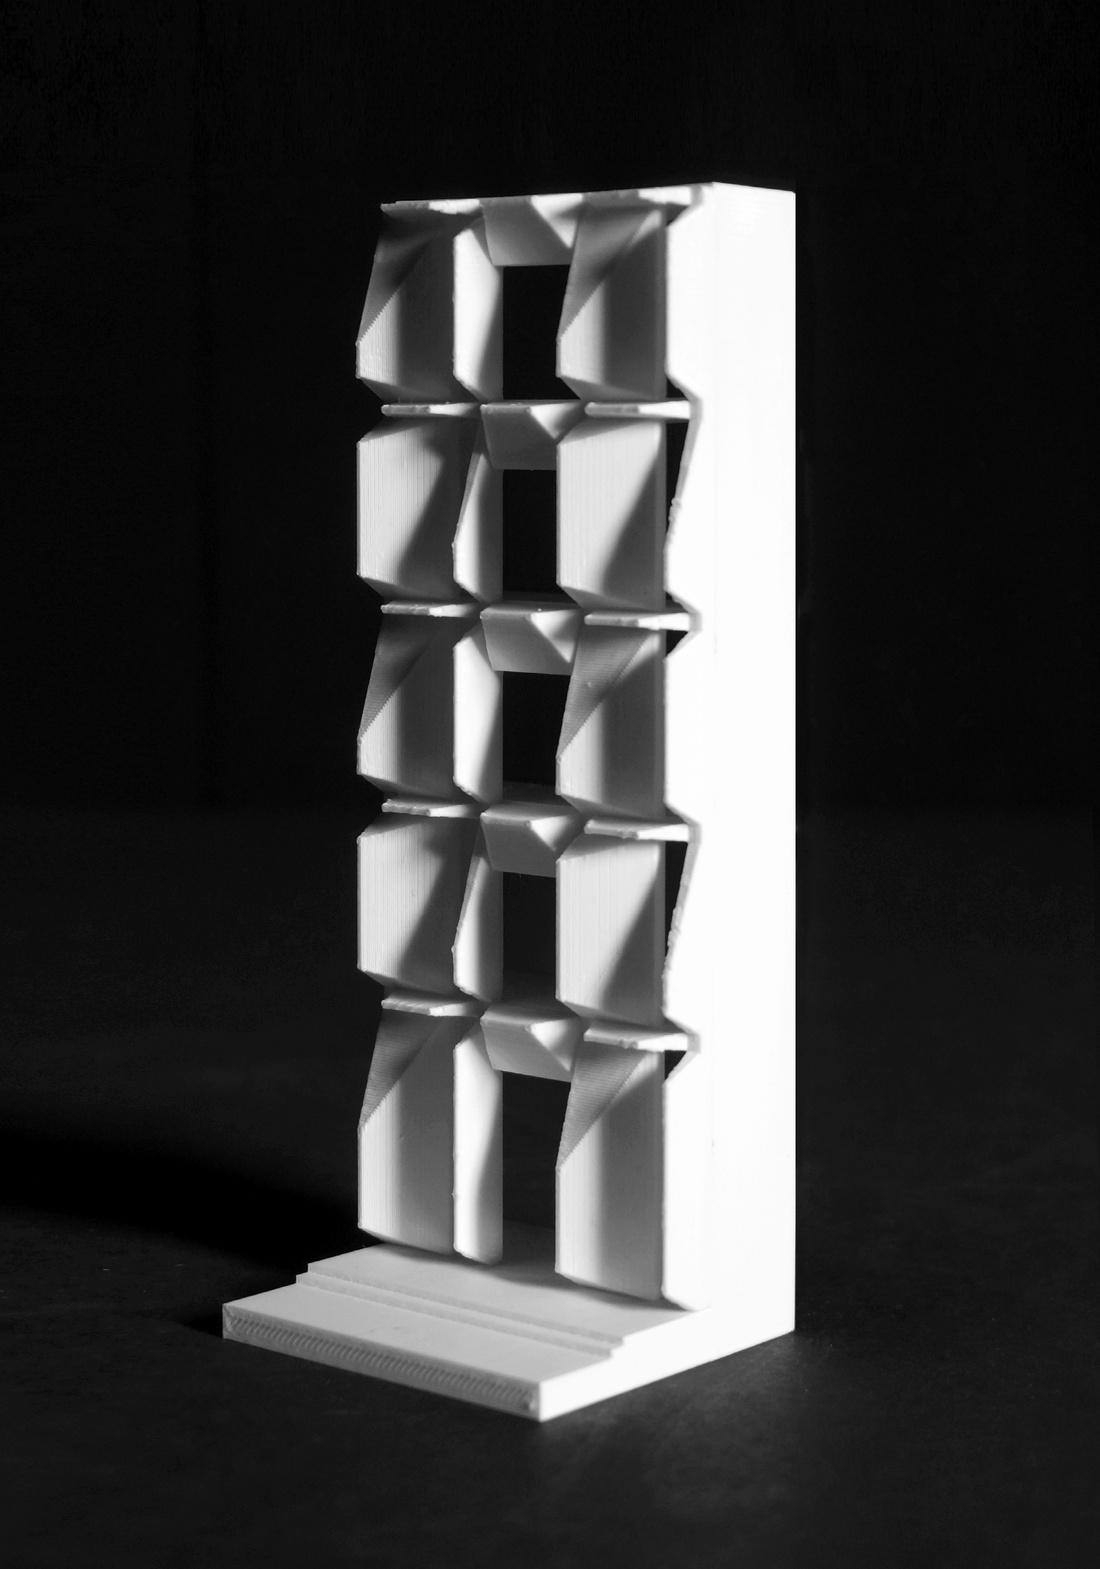 Facade study by Graham Brindle.